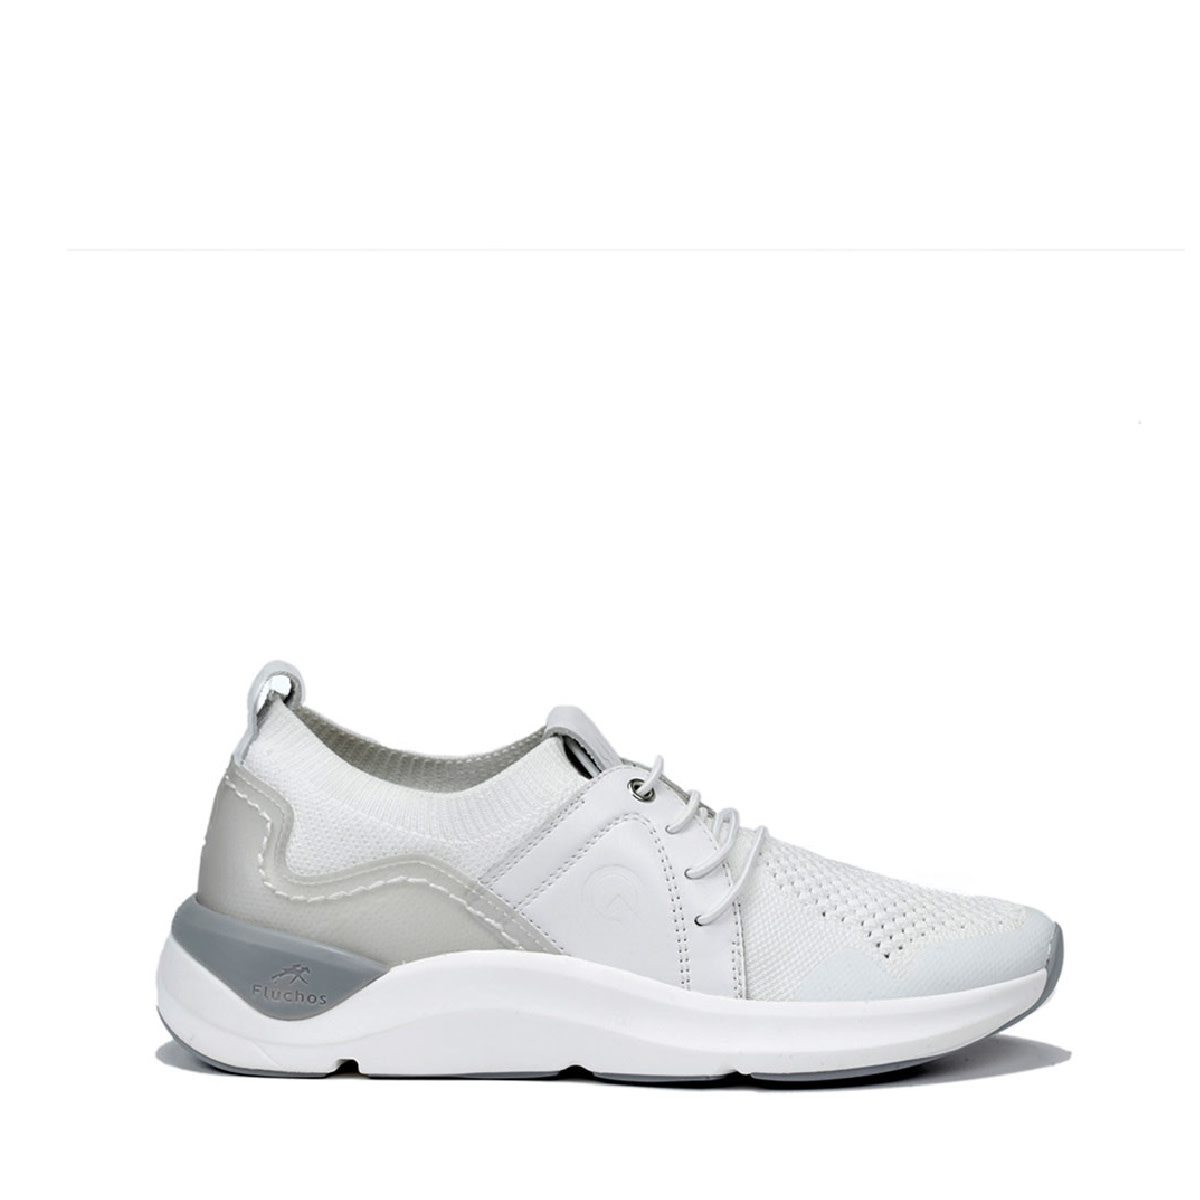 Atom One Atom One F0876 Sneaker White